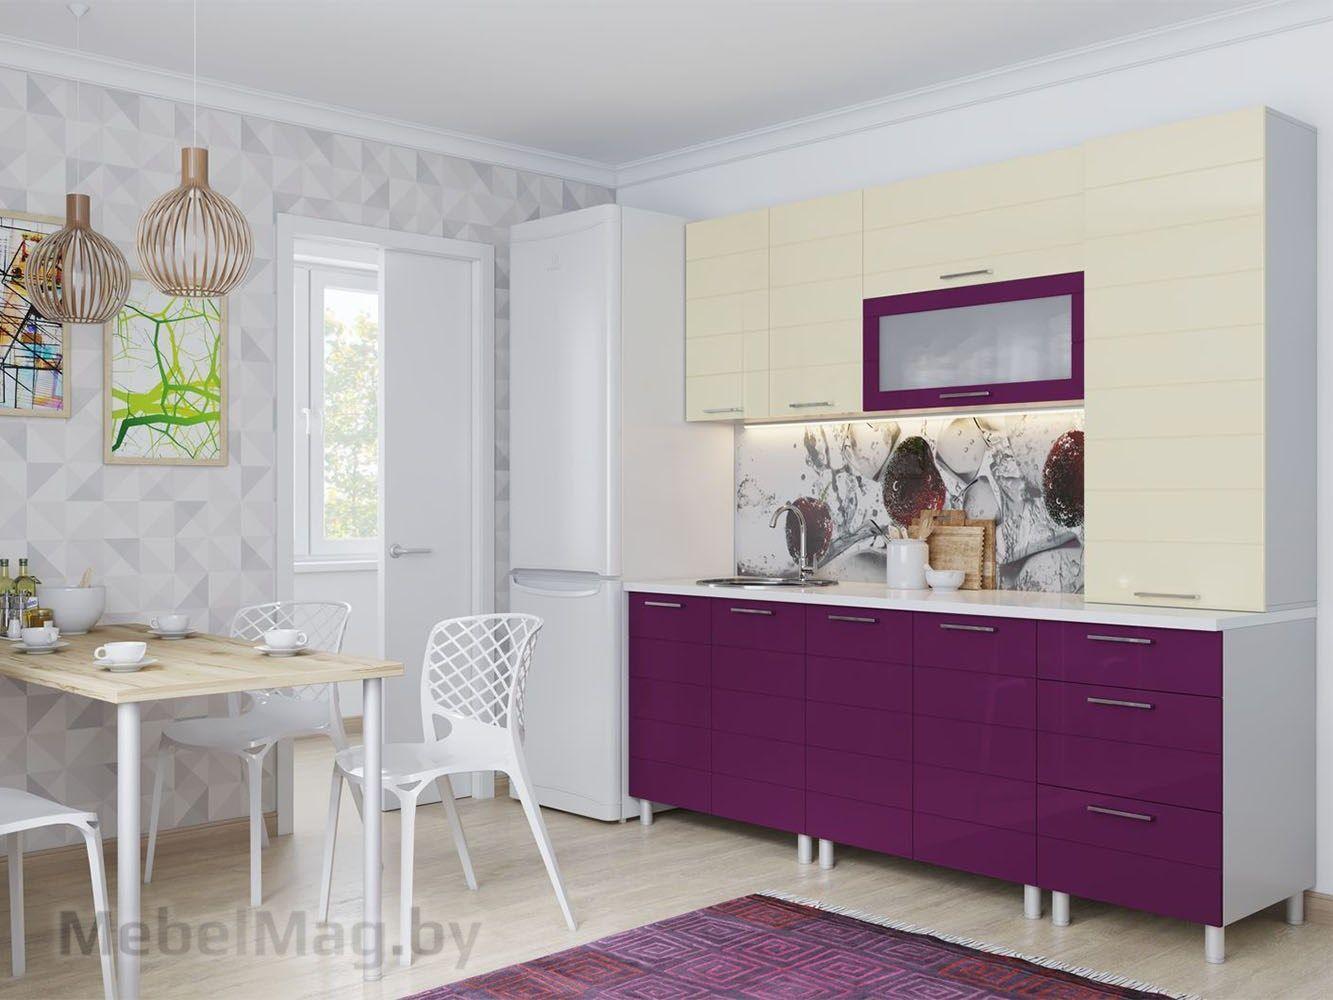 Кухня Лаура - Ваниль/Баклажан